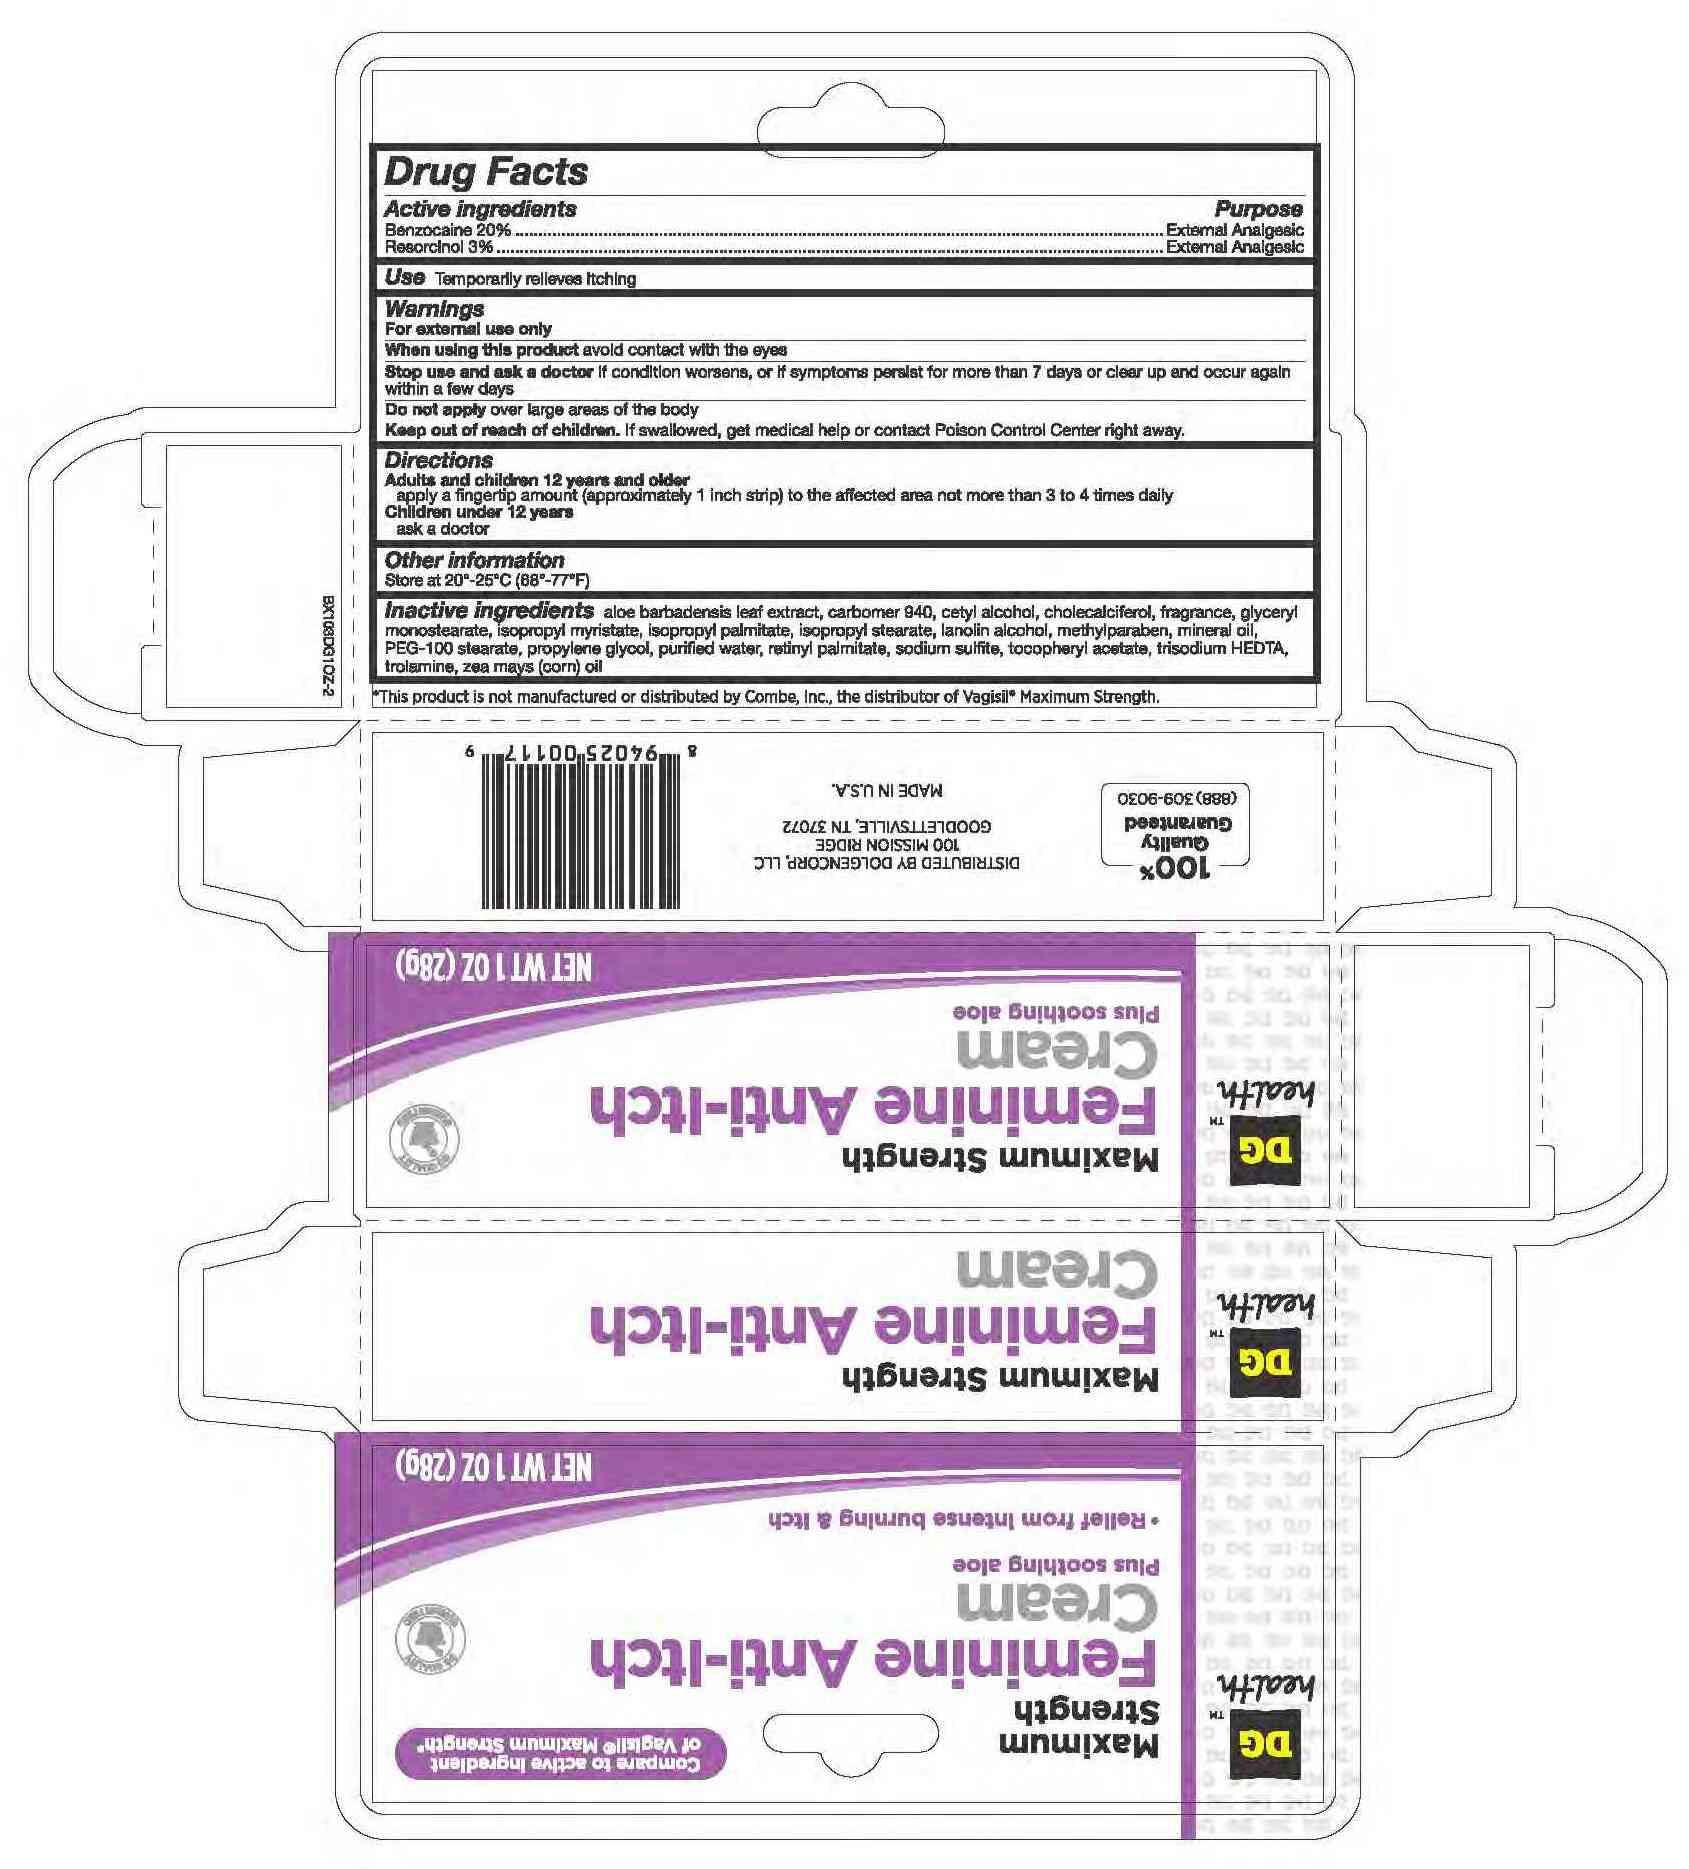 Benzocaine And Resorcinol Cream [Dolgencorp, Inc]